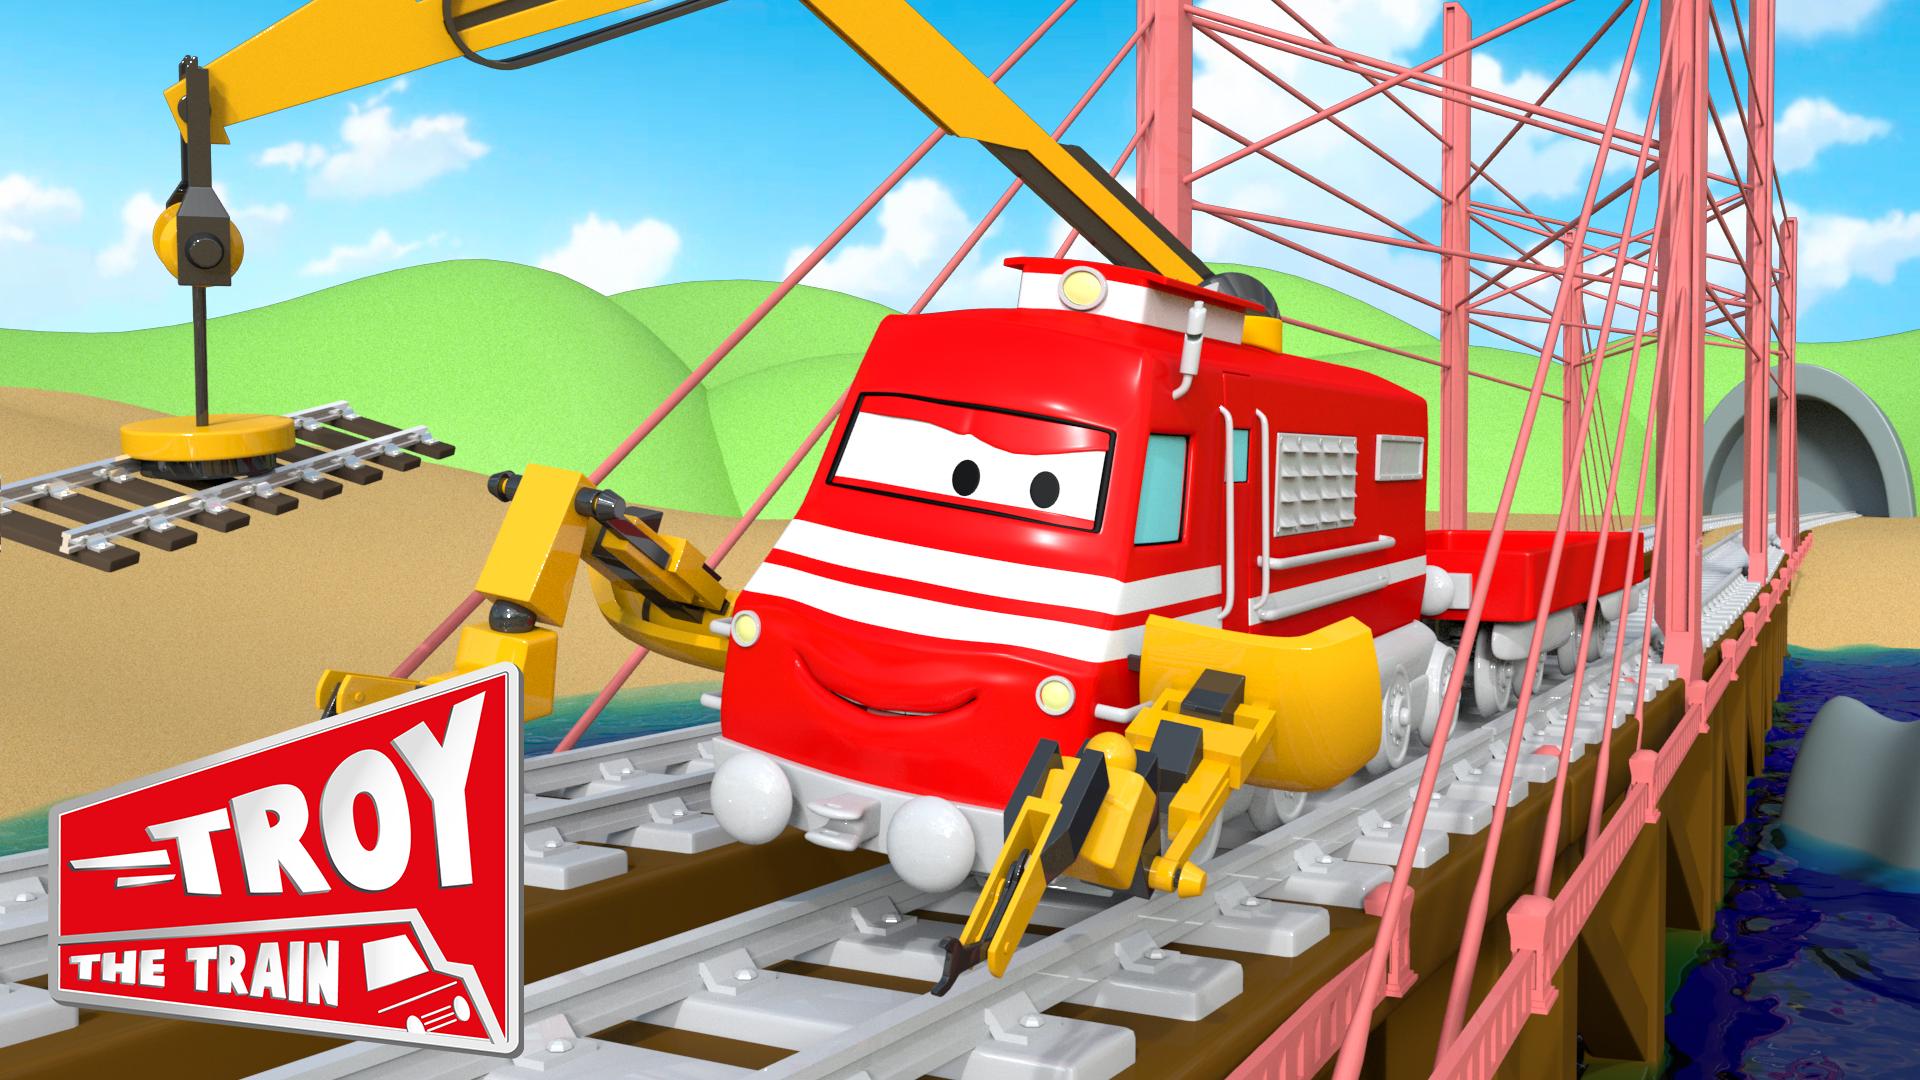 Troy The Train on Amazon Prime Video UK